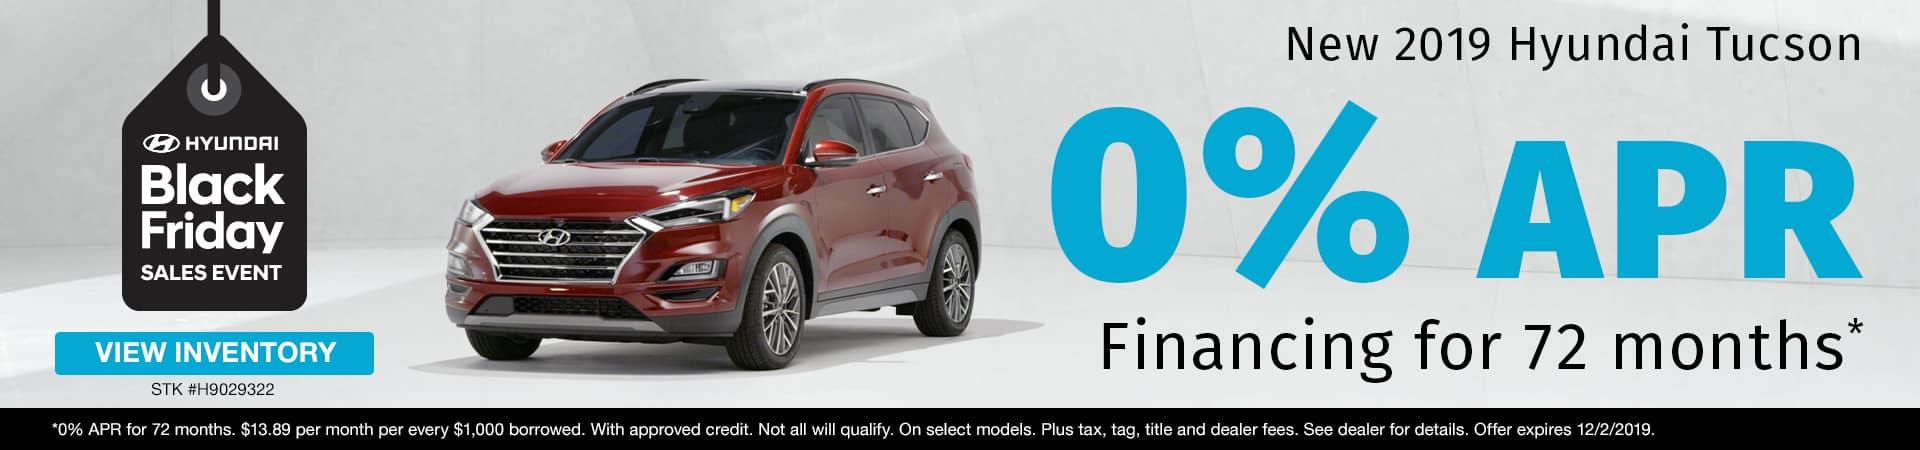 Get 0% APR Financing on a new 2019 Hyundai Tucson in Murfreesboro TN